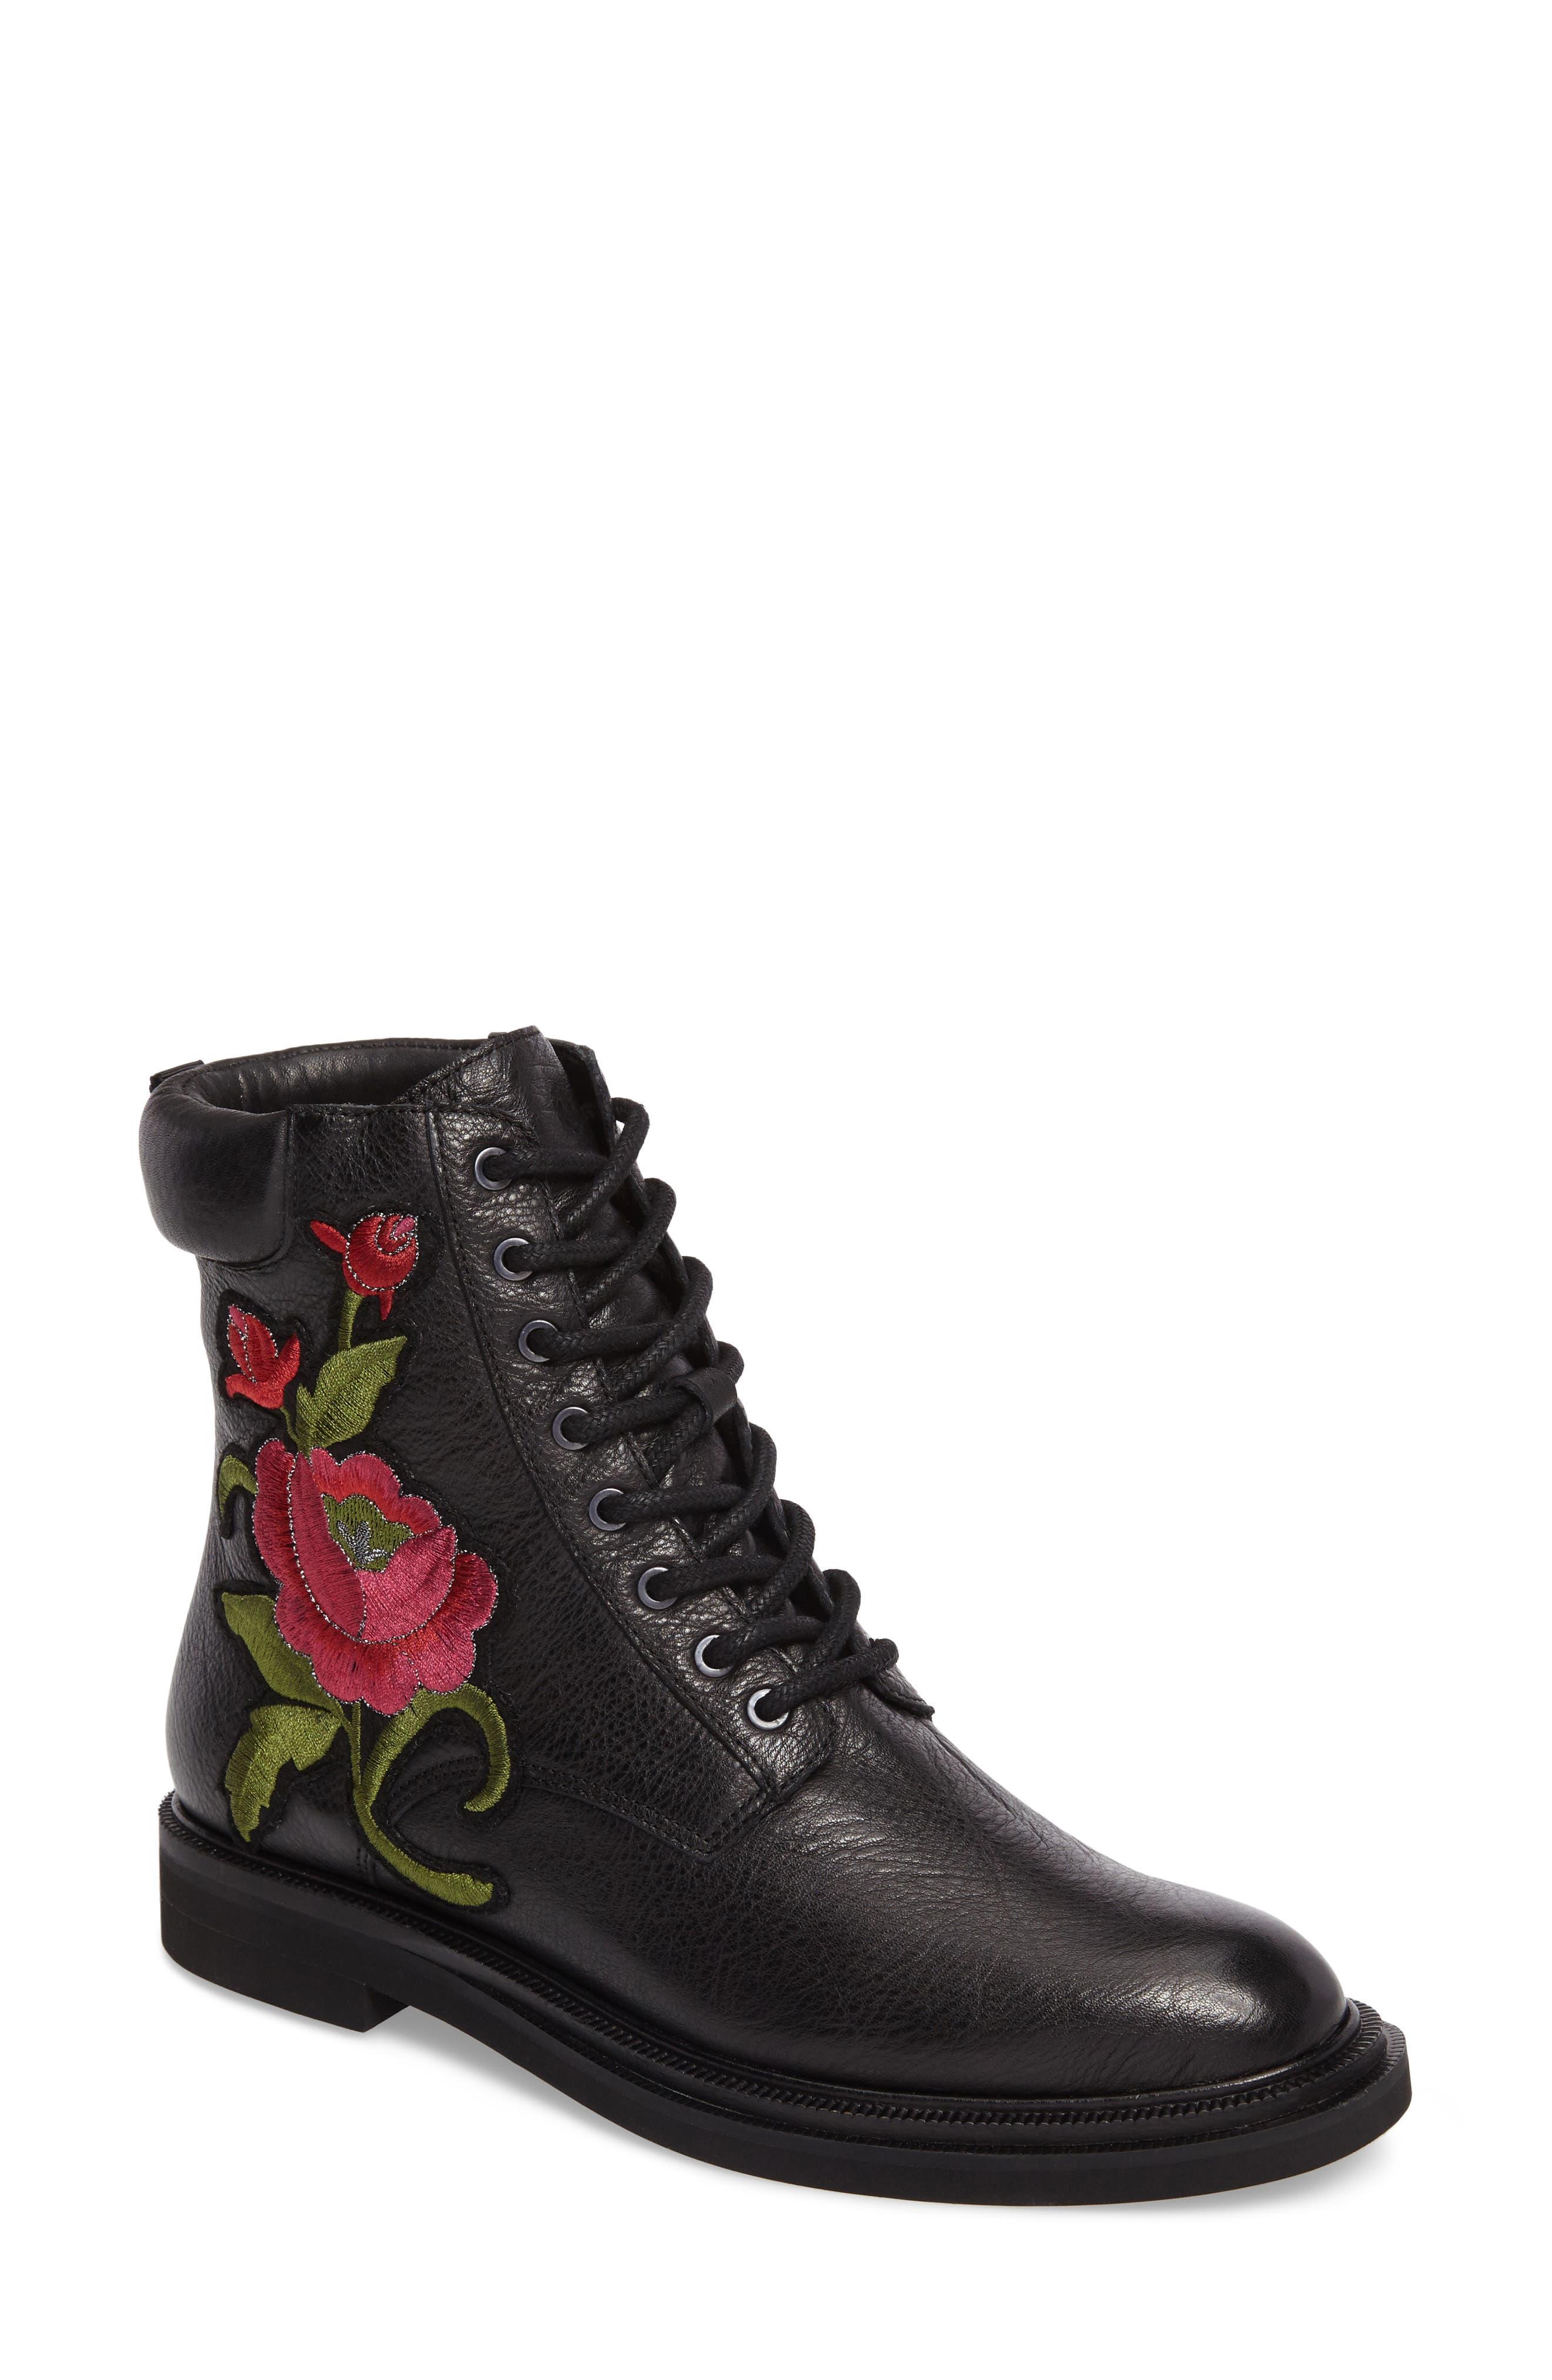 Ashton 2 Embroidered Boot,                         Main,                         color, 001